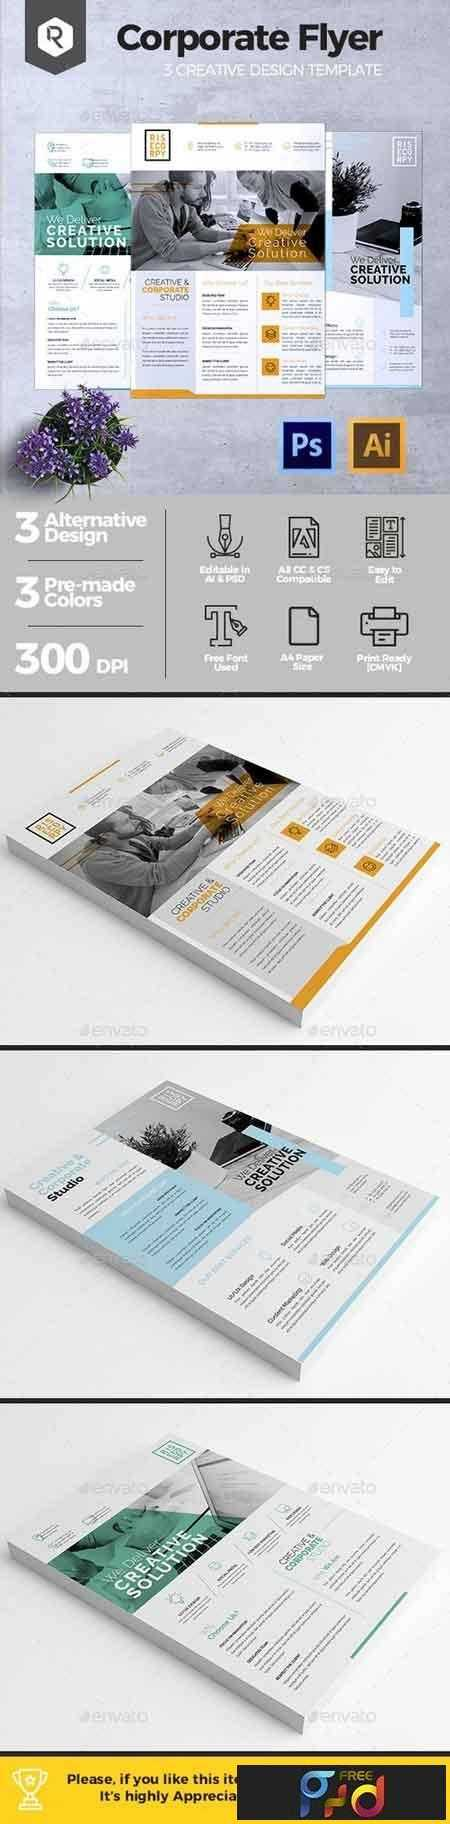 1809105 Creative Corporate Flyer Vol. 02 20391929 1